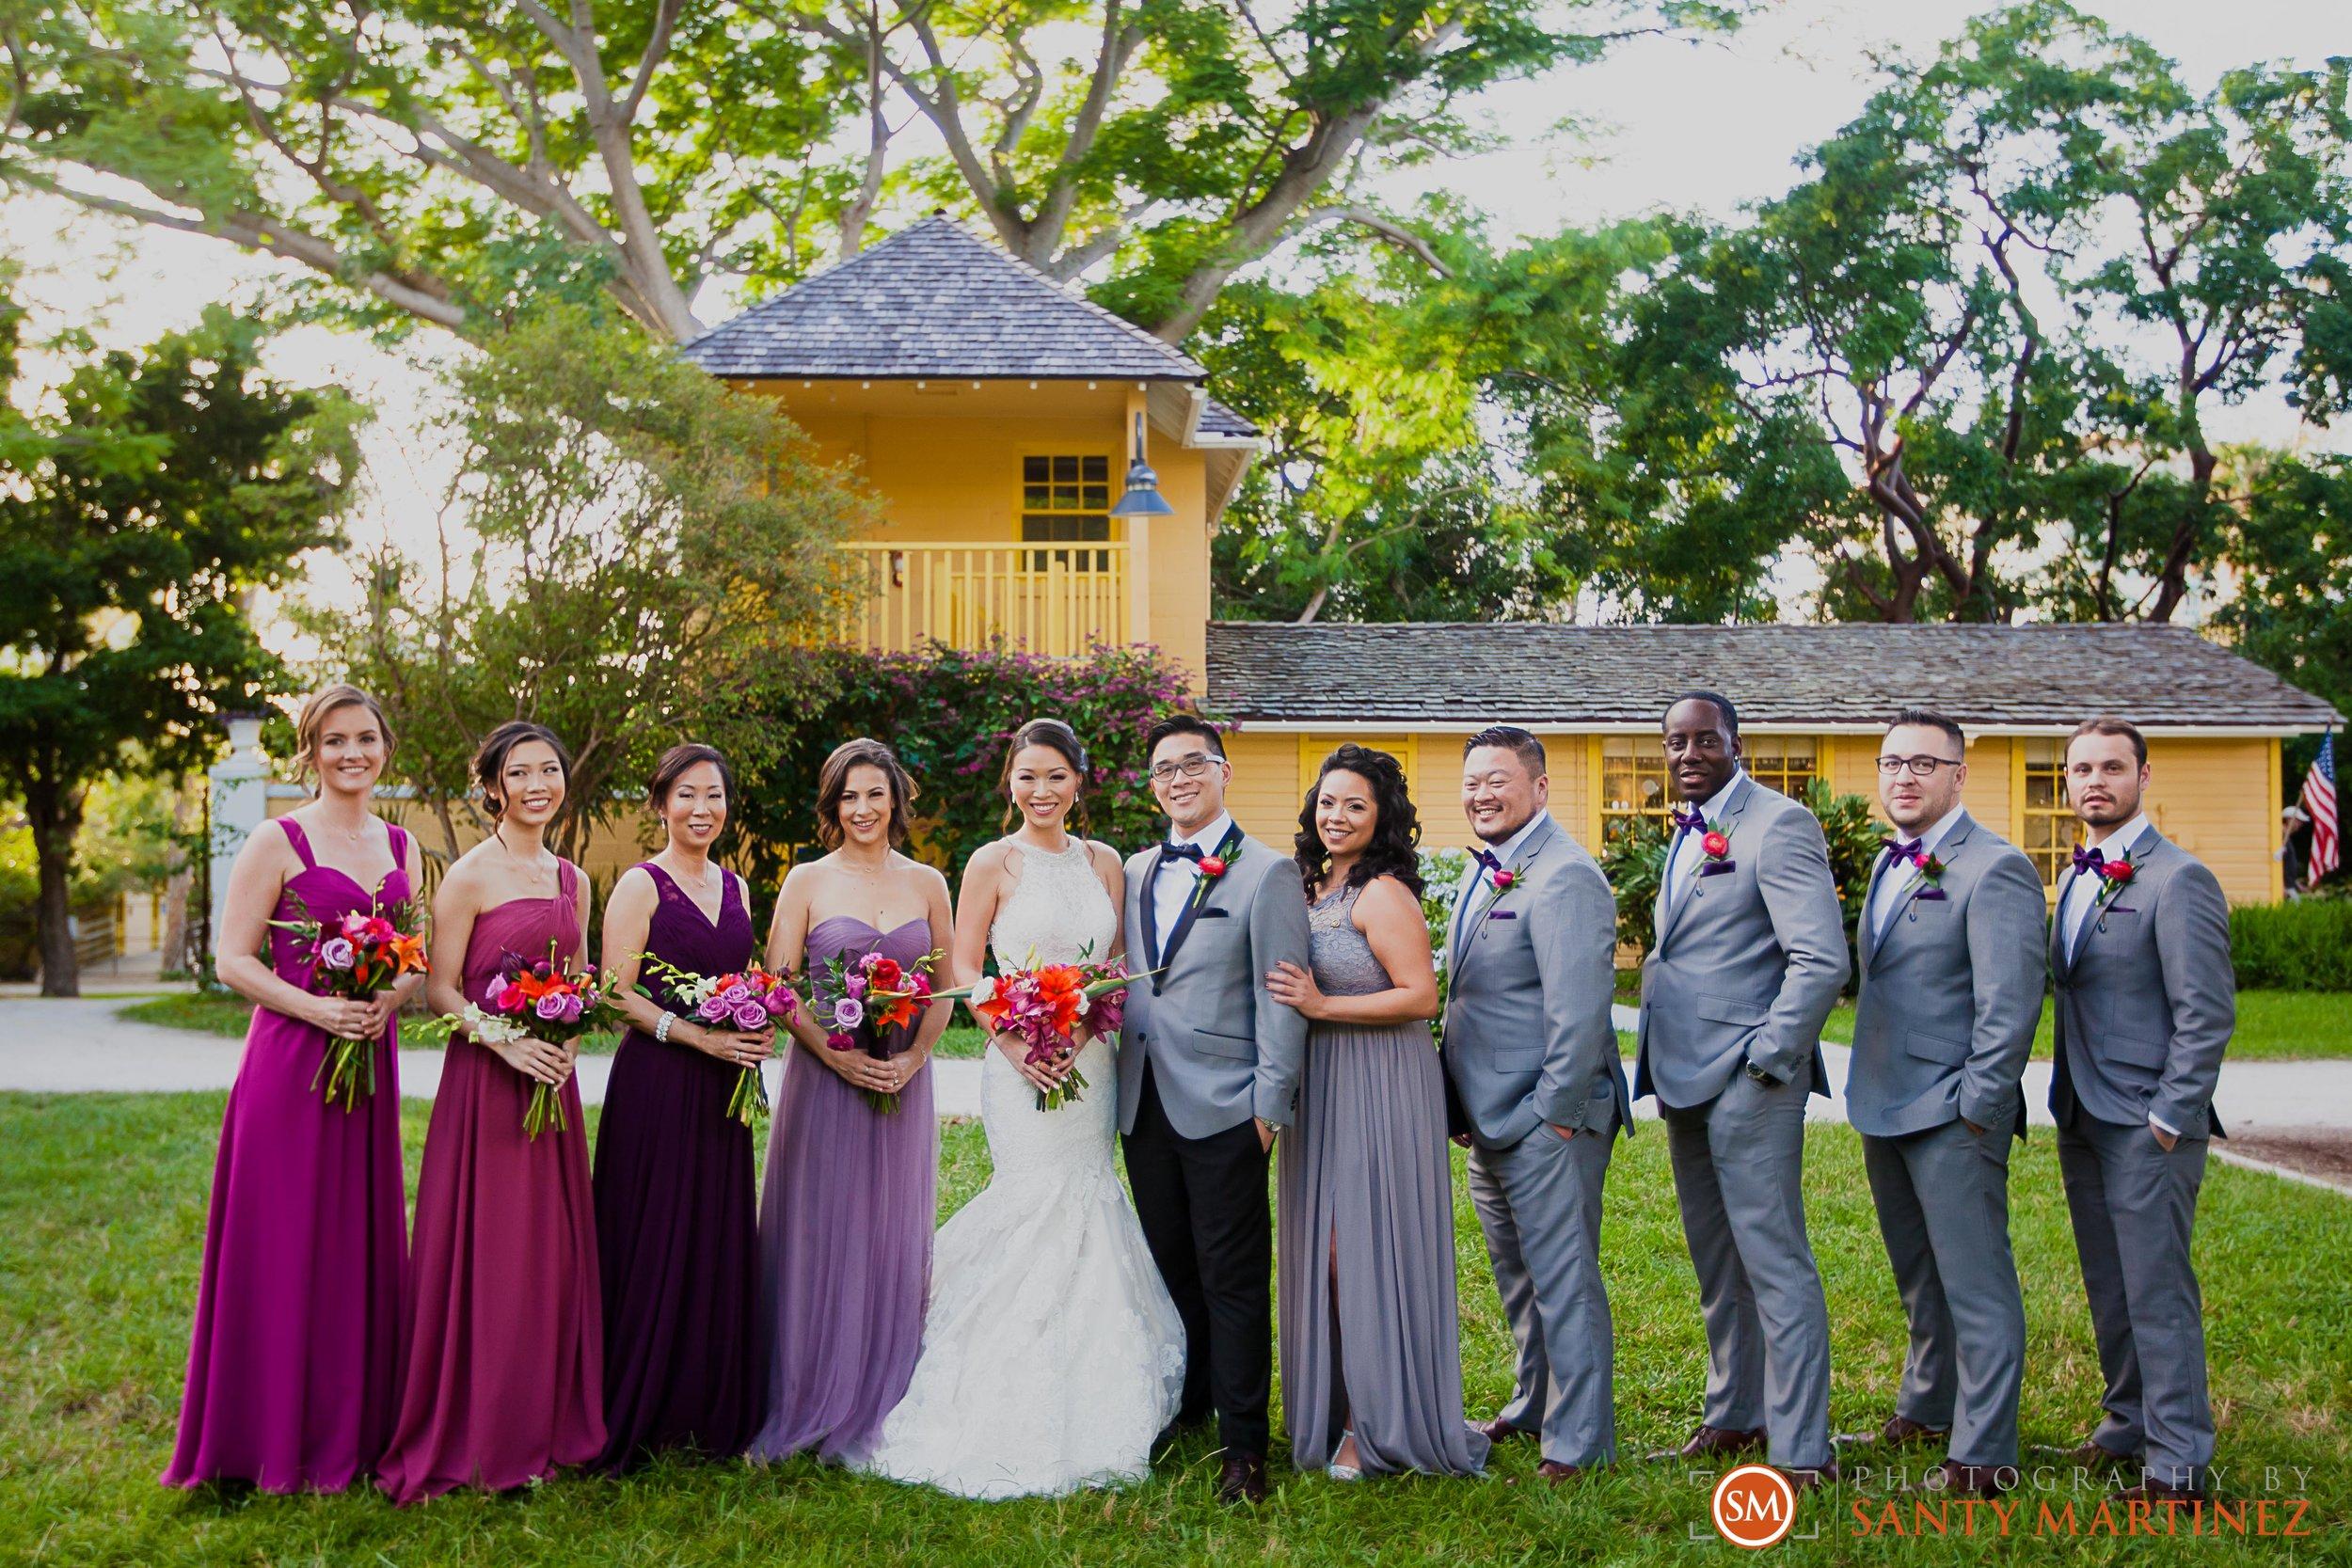 Wedding Bonnet House - Photography by Santy Martinez-22.jpg